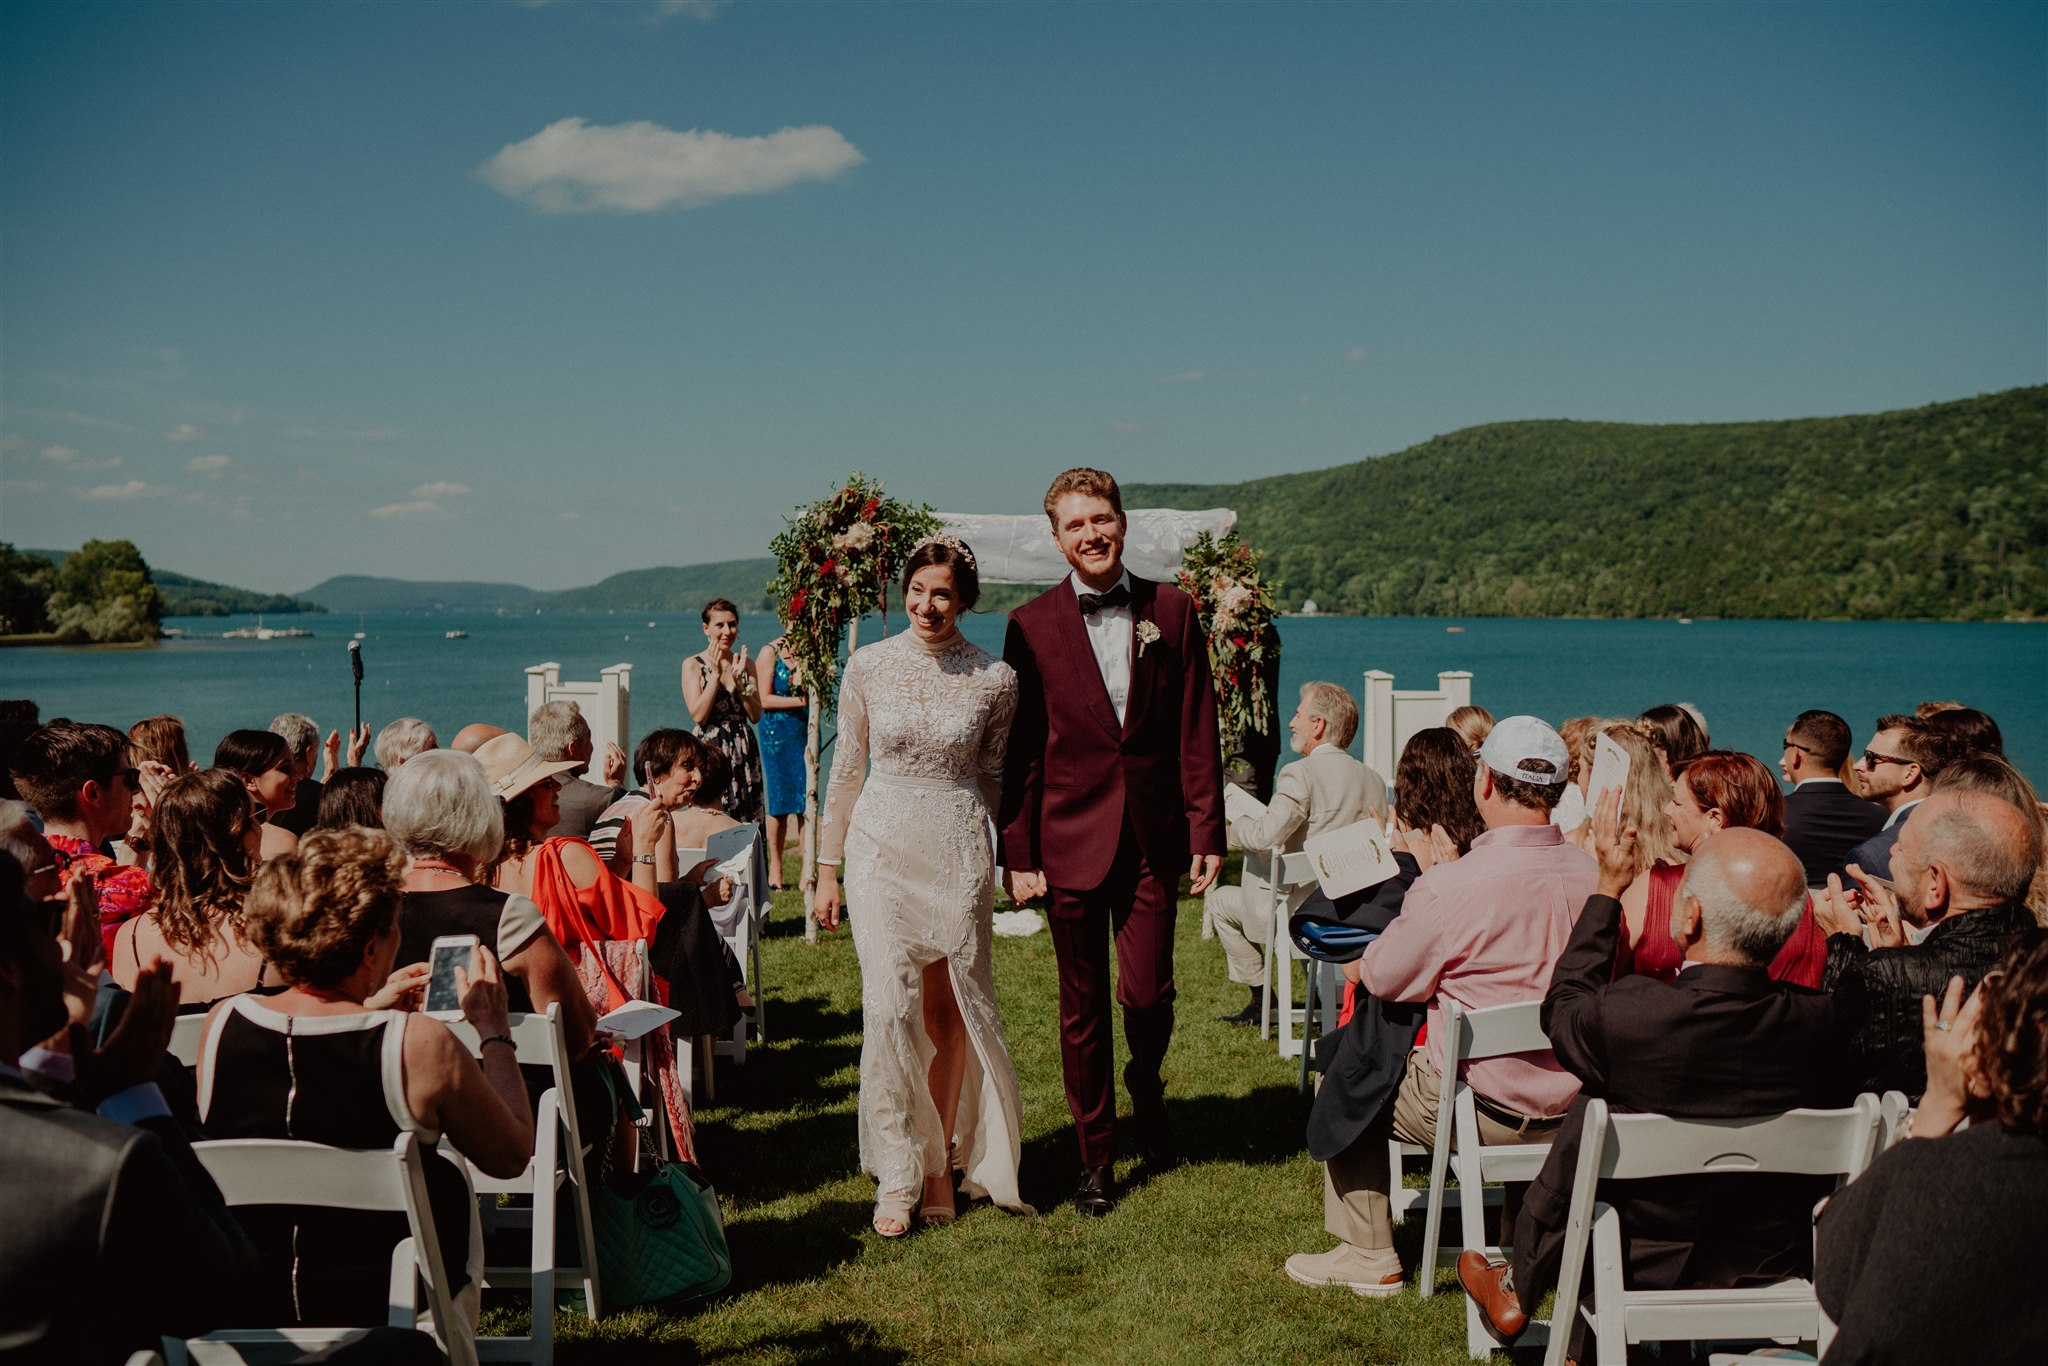 Chellise_Michael_Photography_Hudson_Valley_Wedding_Photographer_Otesaga_Hotel-3142.jpg